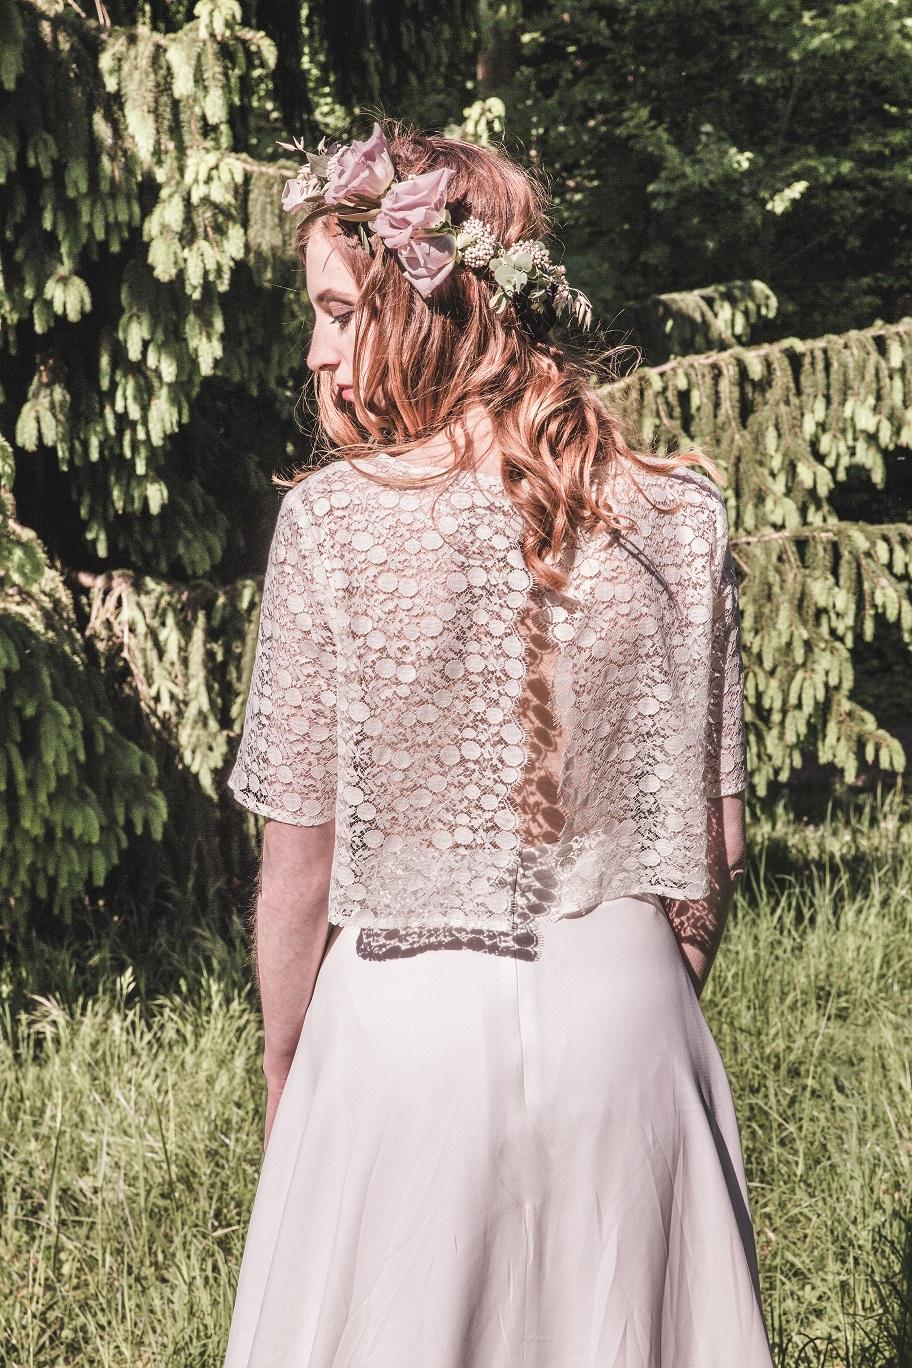 Top Amandine - collection 2017 - Marion Lefebvre